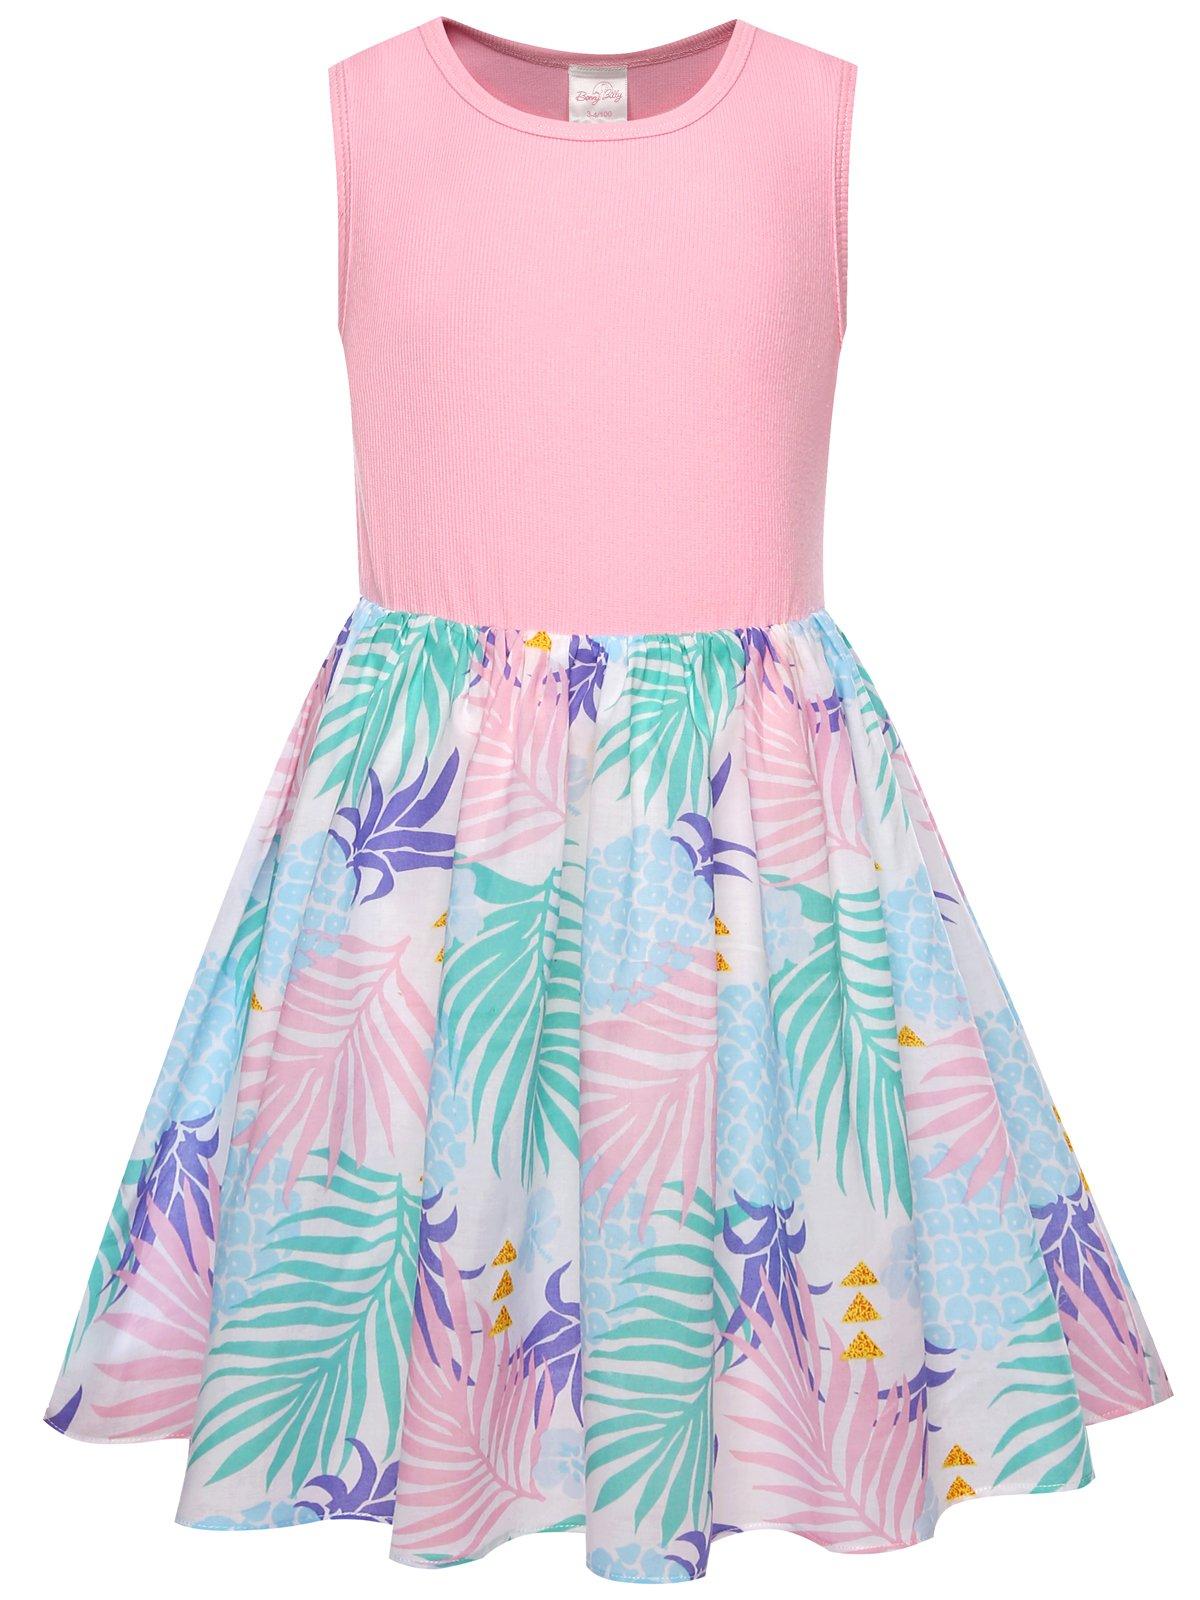 Bonny Billy Girls' Summer Pineapple Cotton Tanks Dress for Children 5-6 Years Pink